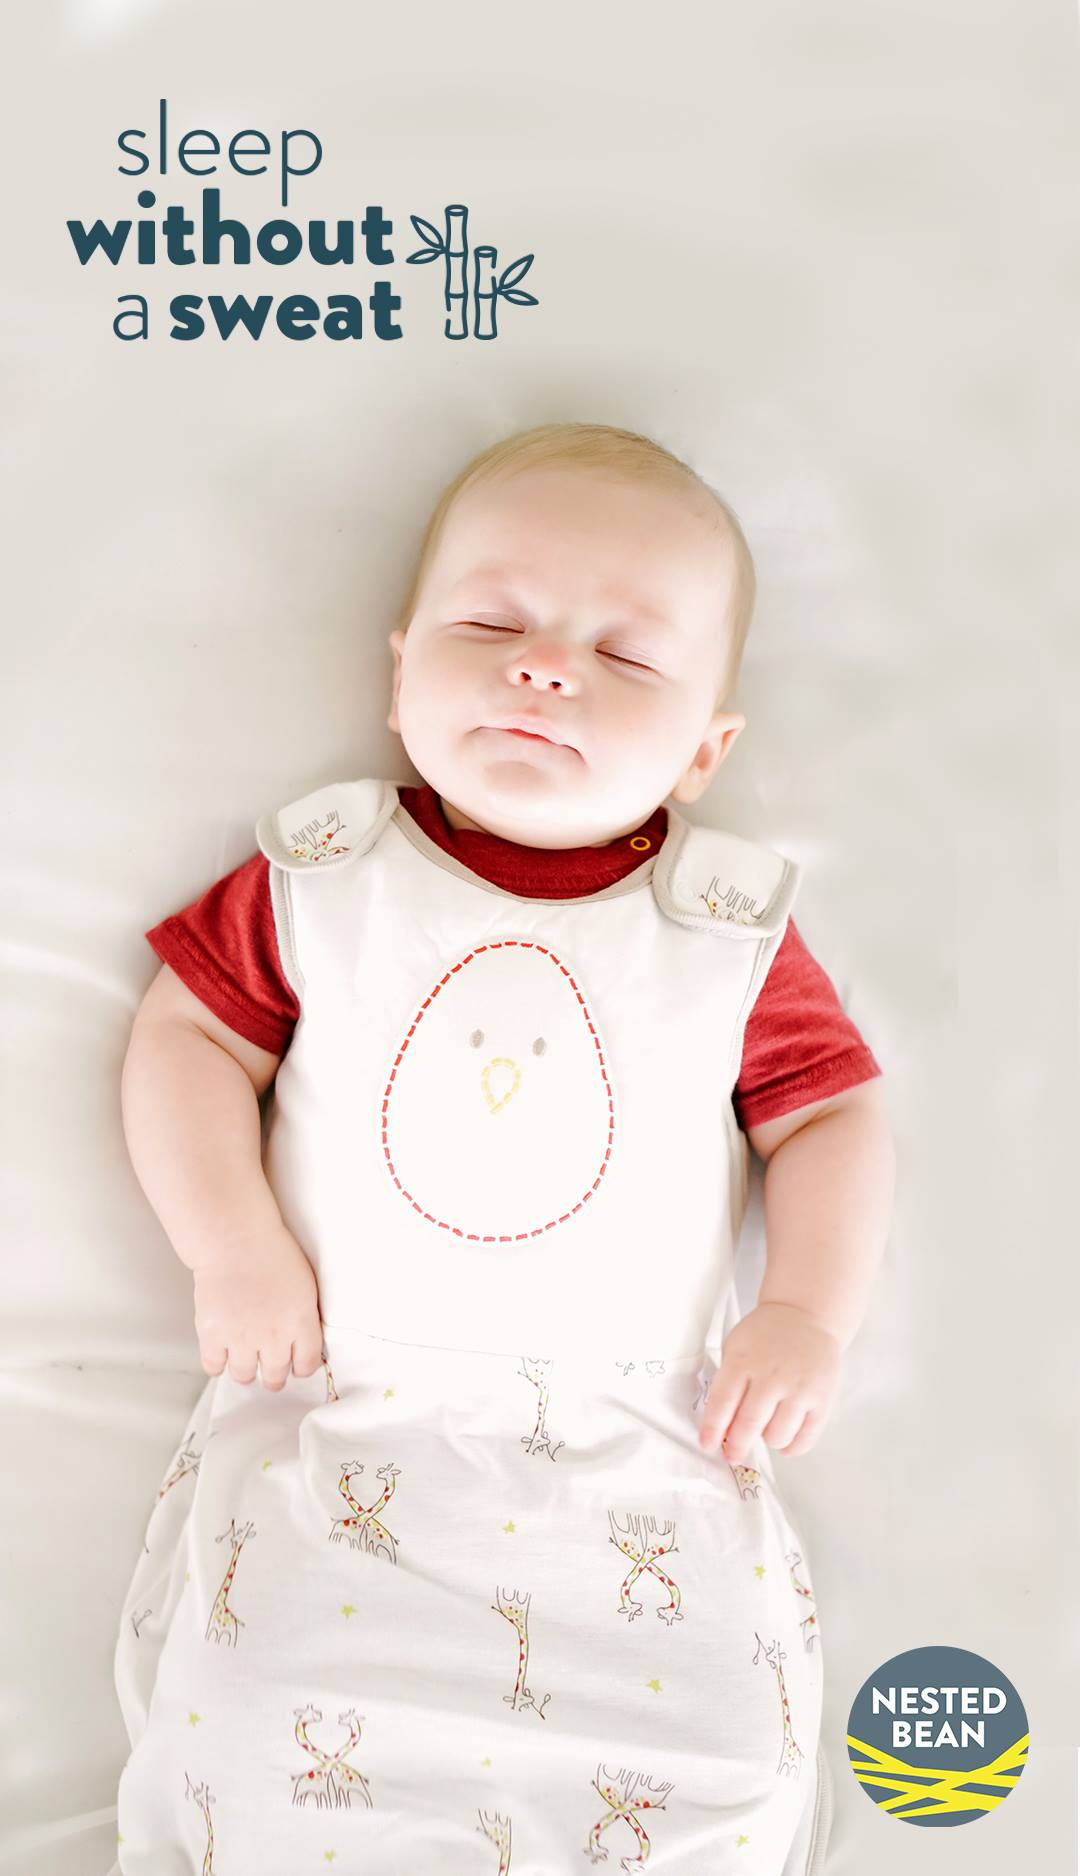 THE ZEN SLEEP SYSTEM - RESTFUL NIGHTS MAKE PLAYFUL MORNINGS